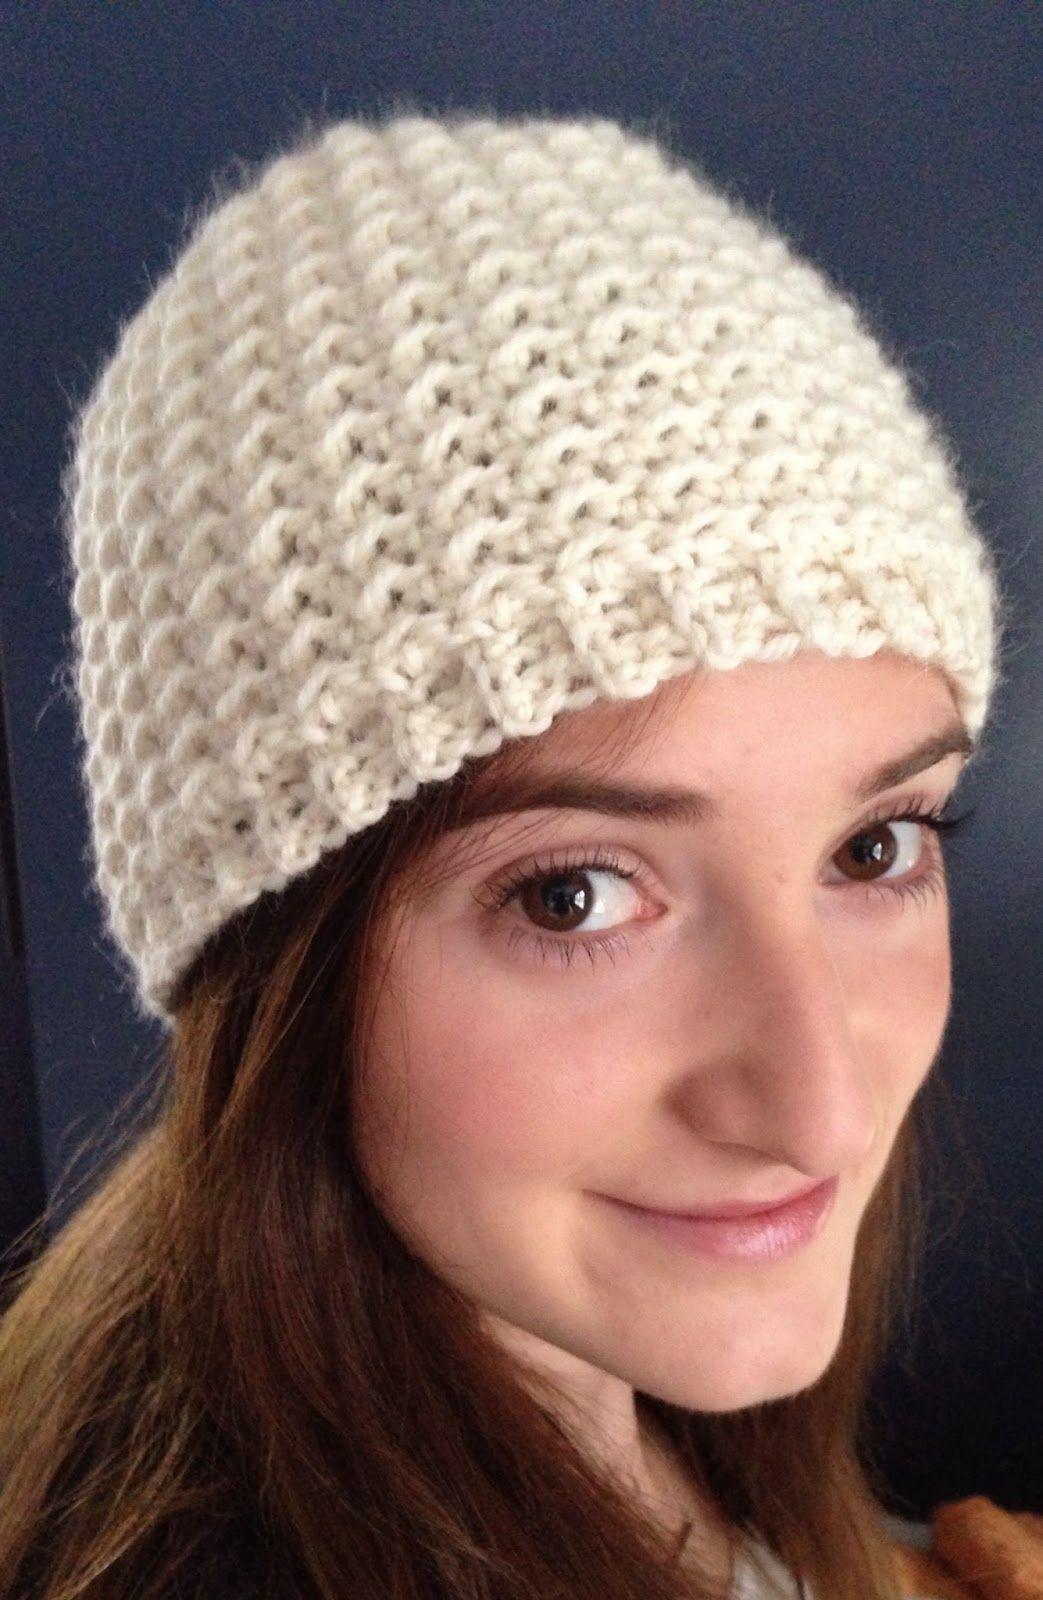 Ball Hank N Skein Oh So Seedy Beanie Free Crochet Hat Pattern